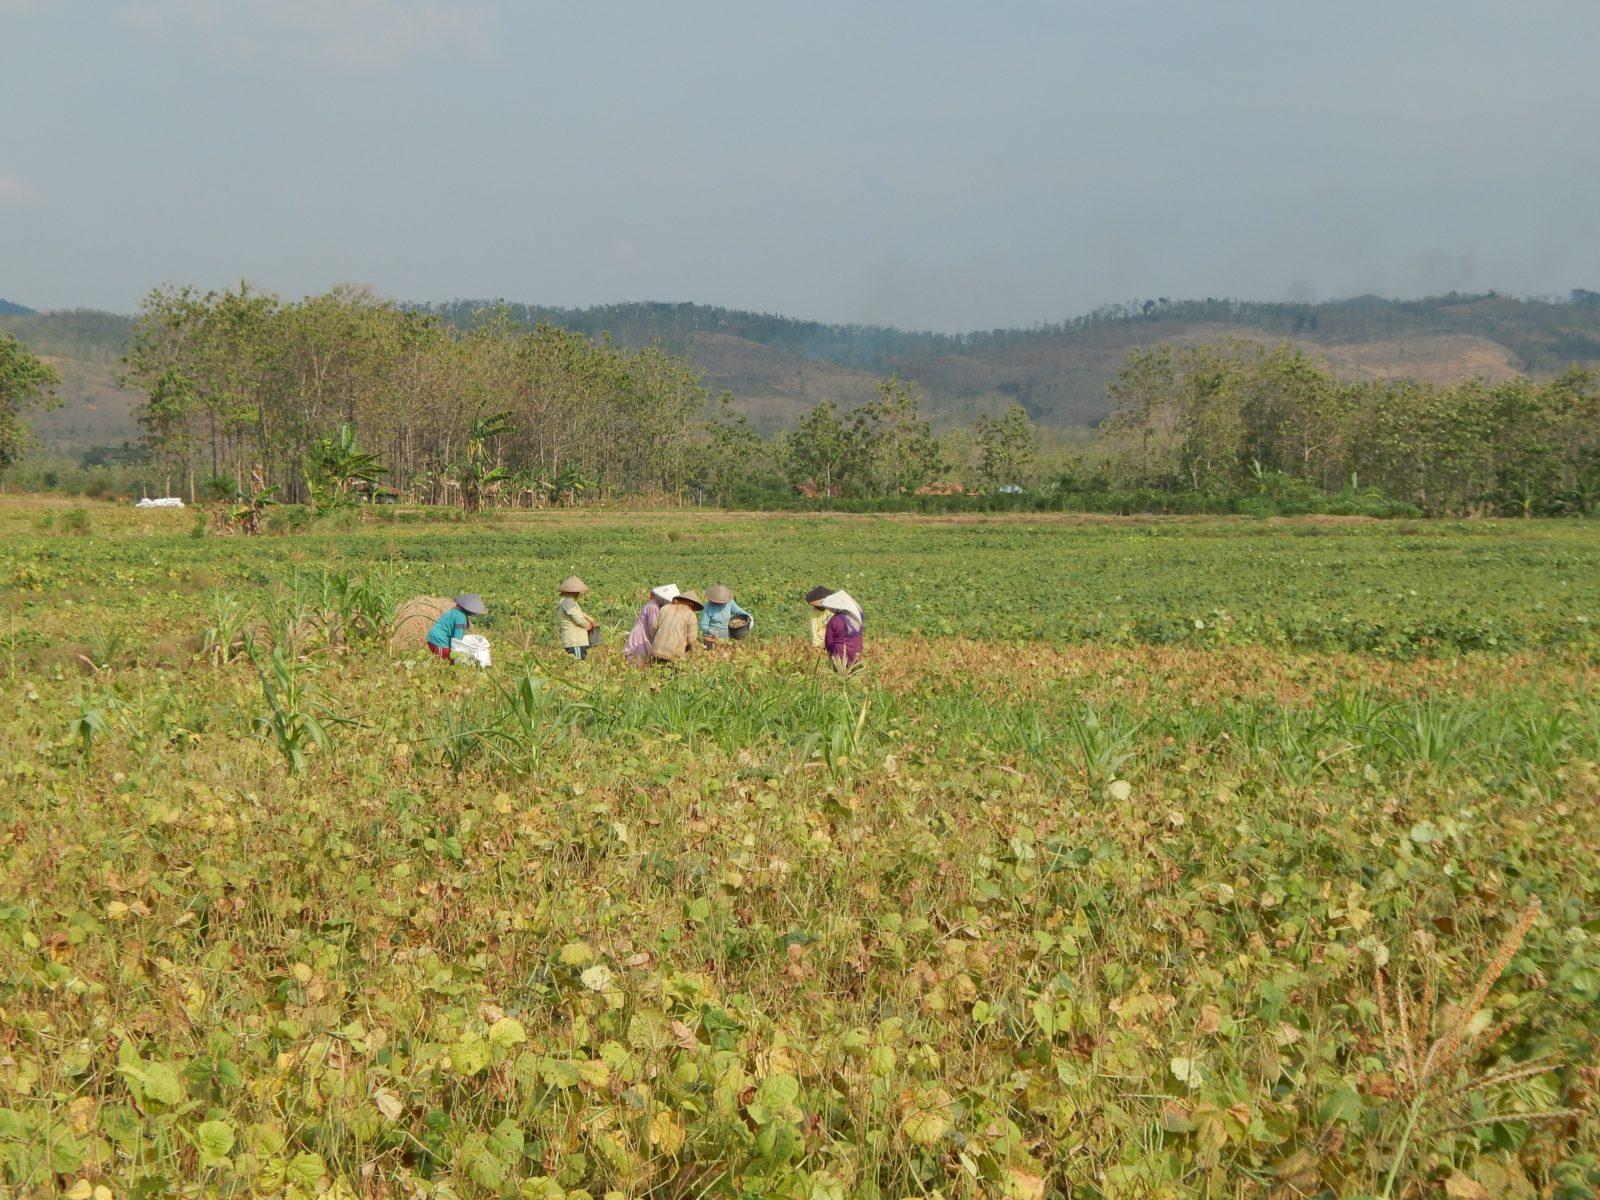 Landarbeiter*innen am Fuß des Kendeng-Gebirges © Save Kendeng